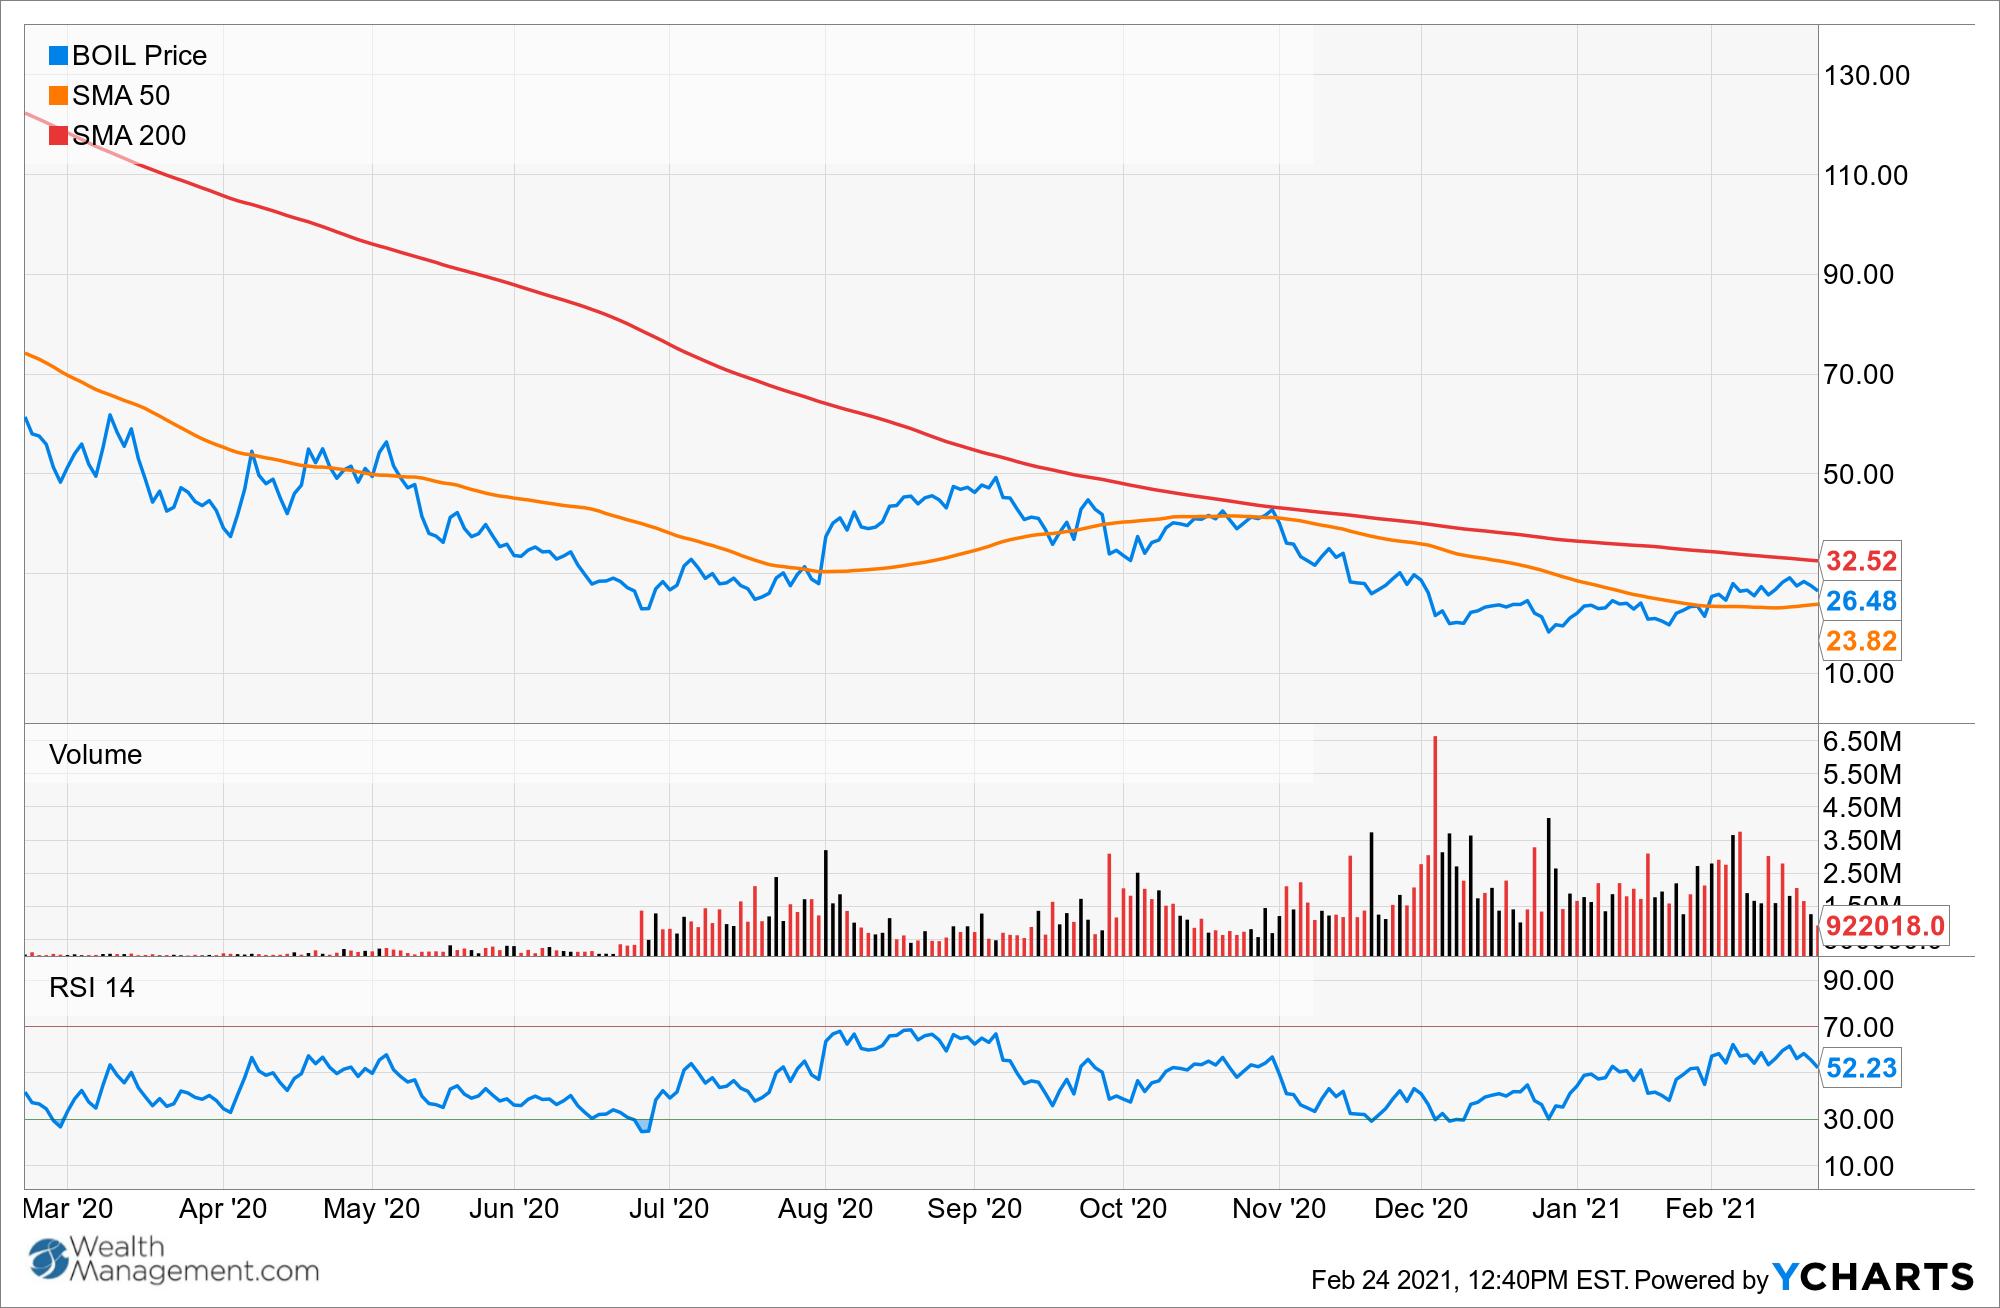 BOIL Chart